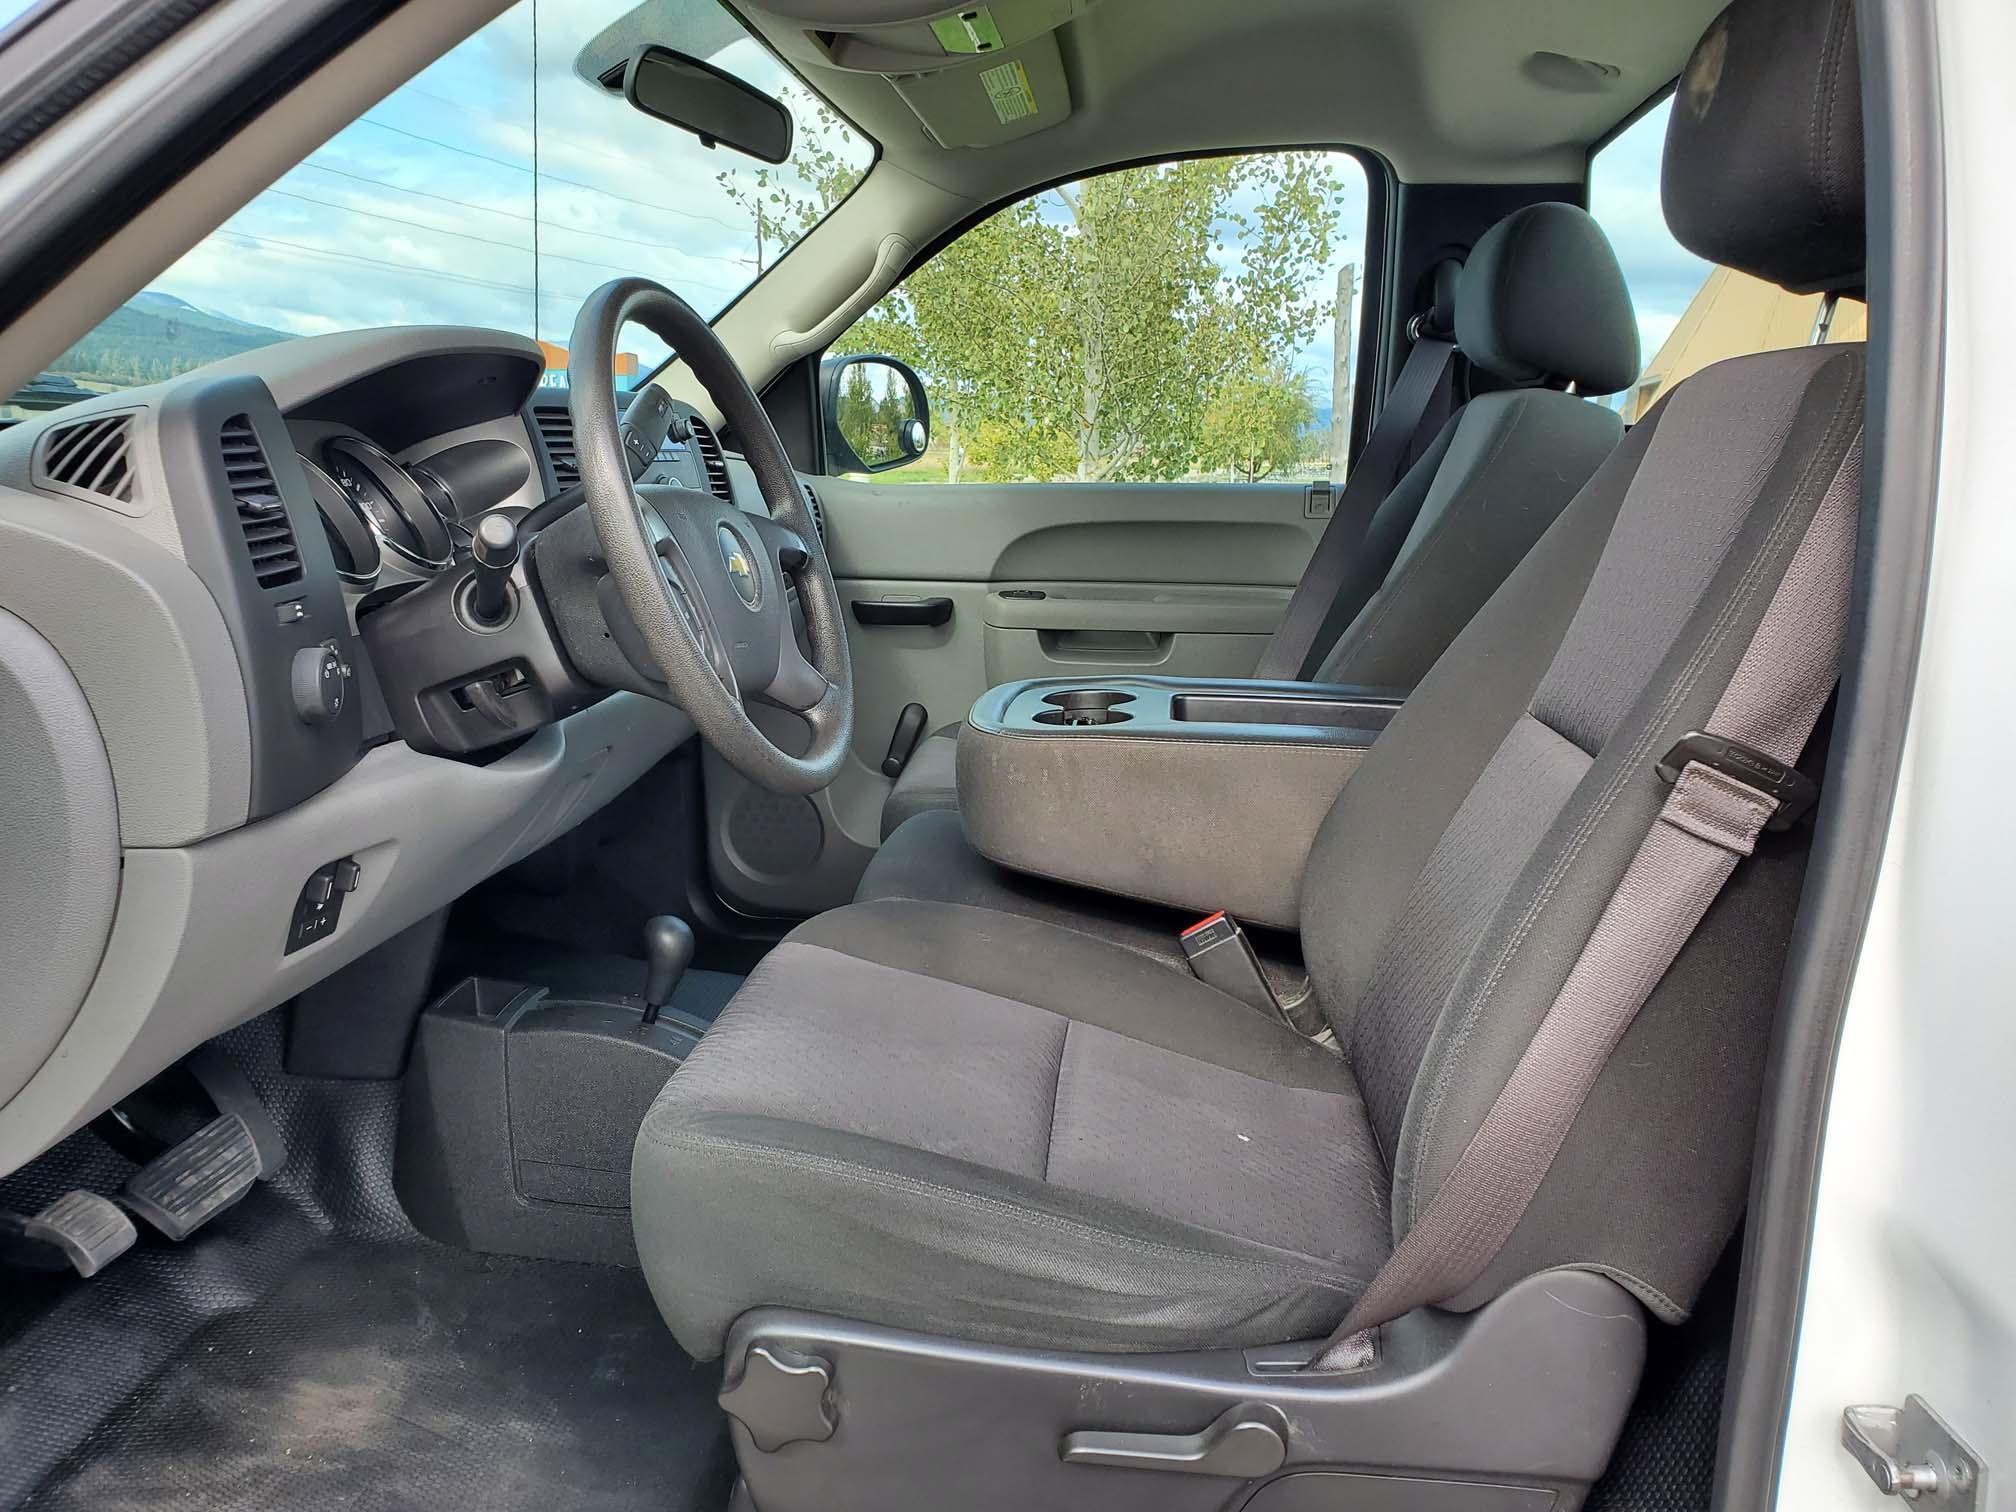 2013 Chevy 2500 Single Cab 3